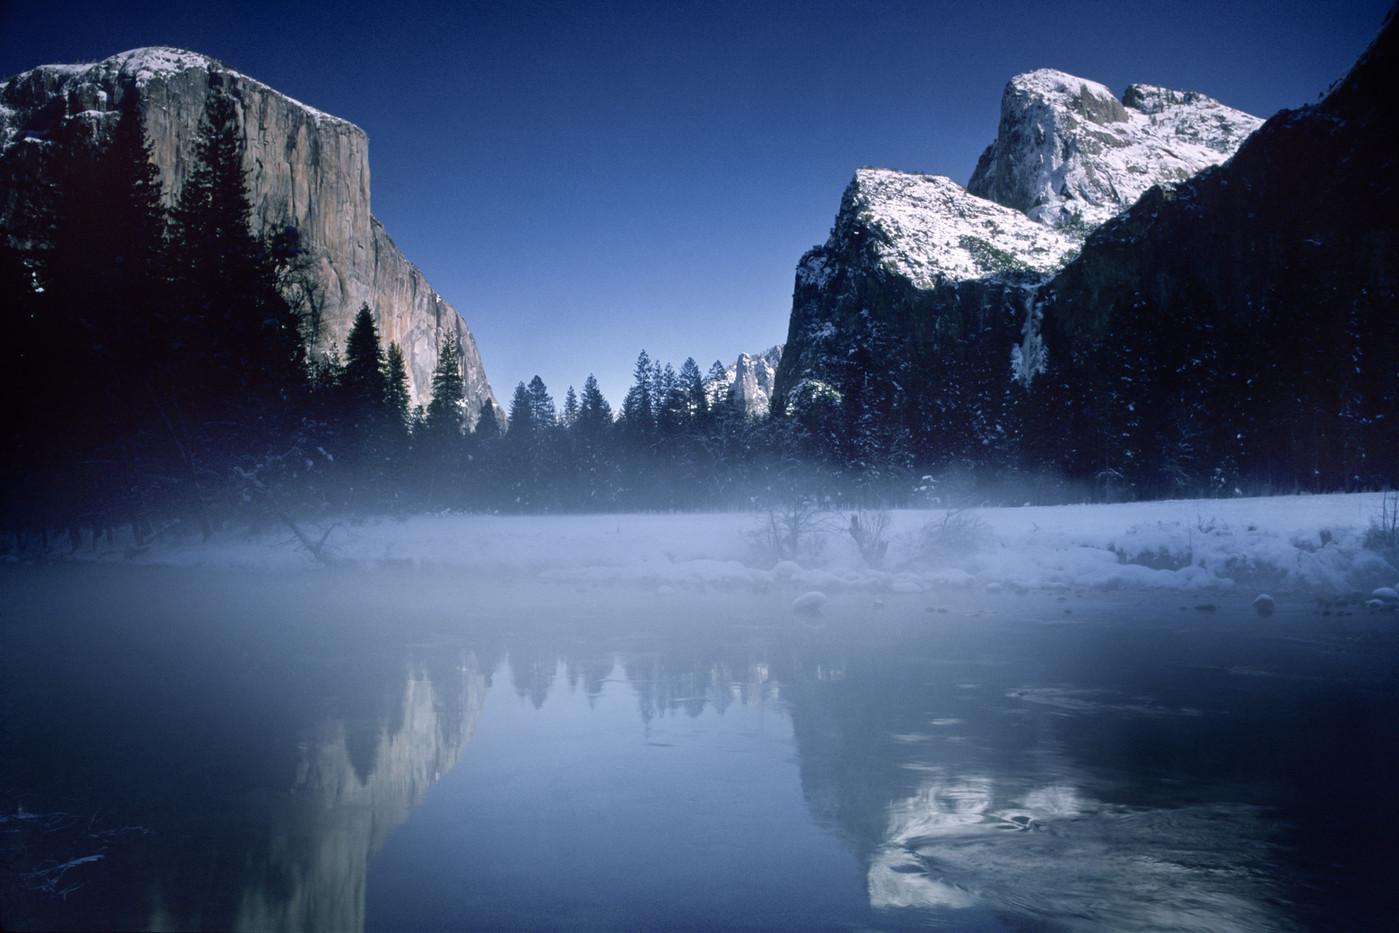 Valley View in Yosemite Valley